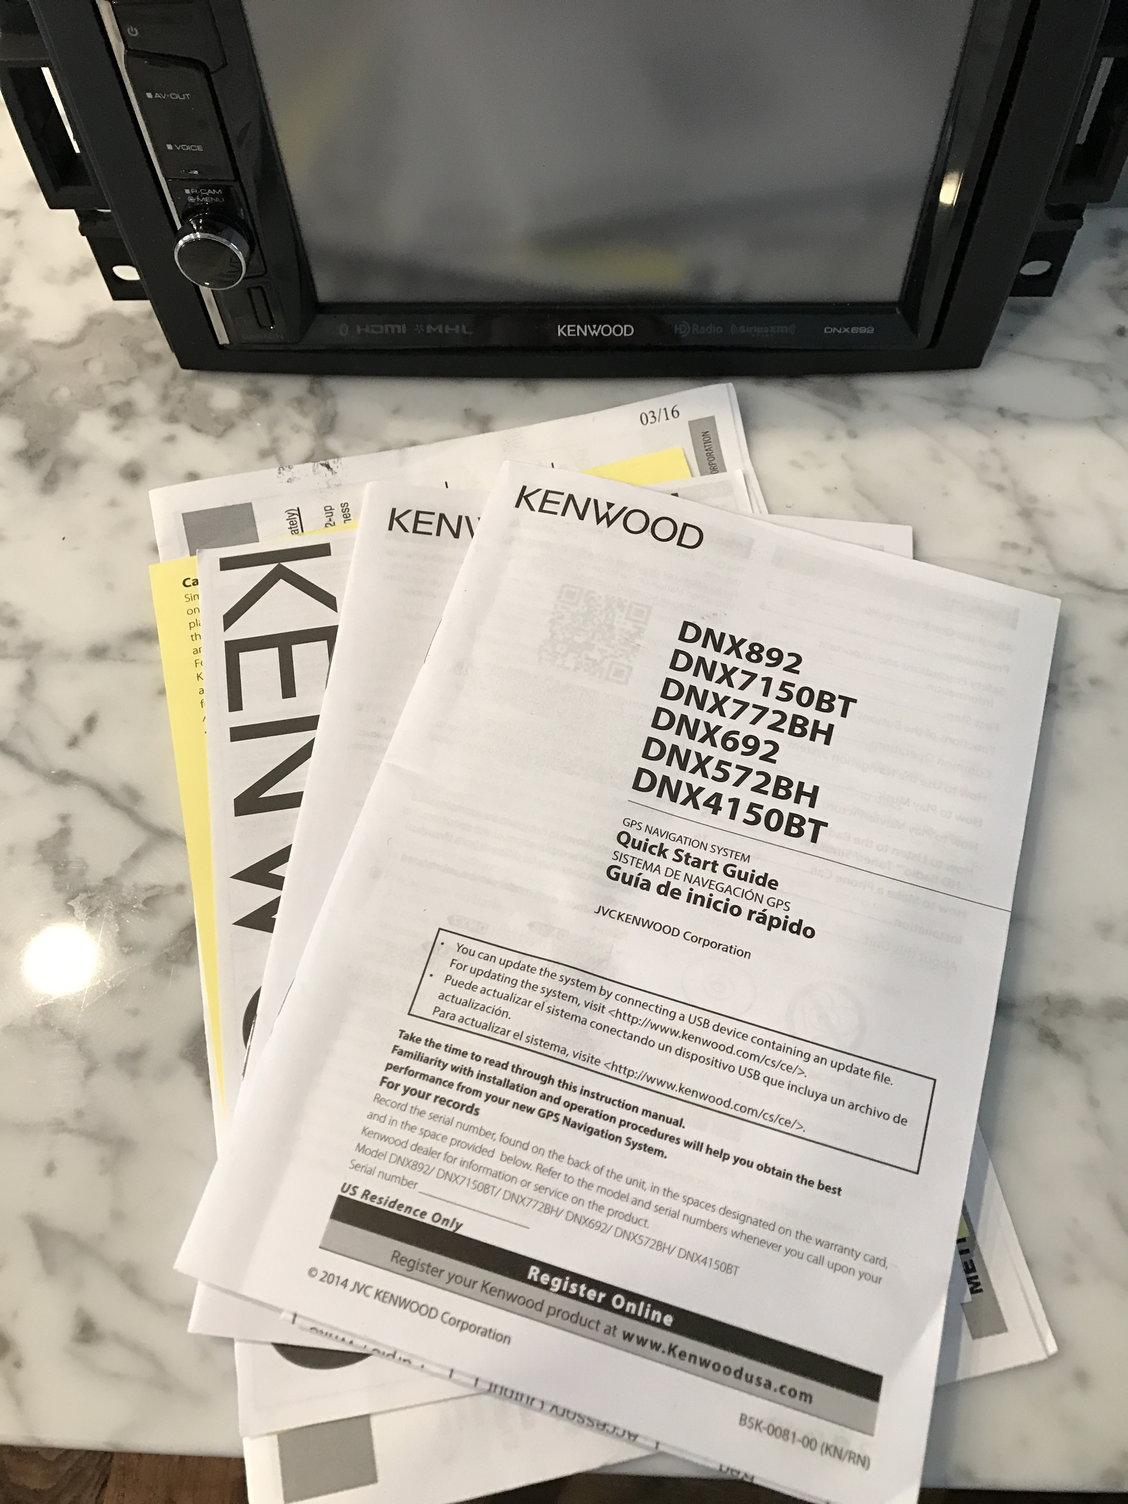 FS: Kenwood DNX692 w/Sirius and wiring harness - CorvetteForum ... on